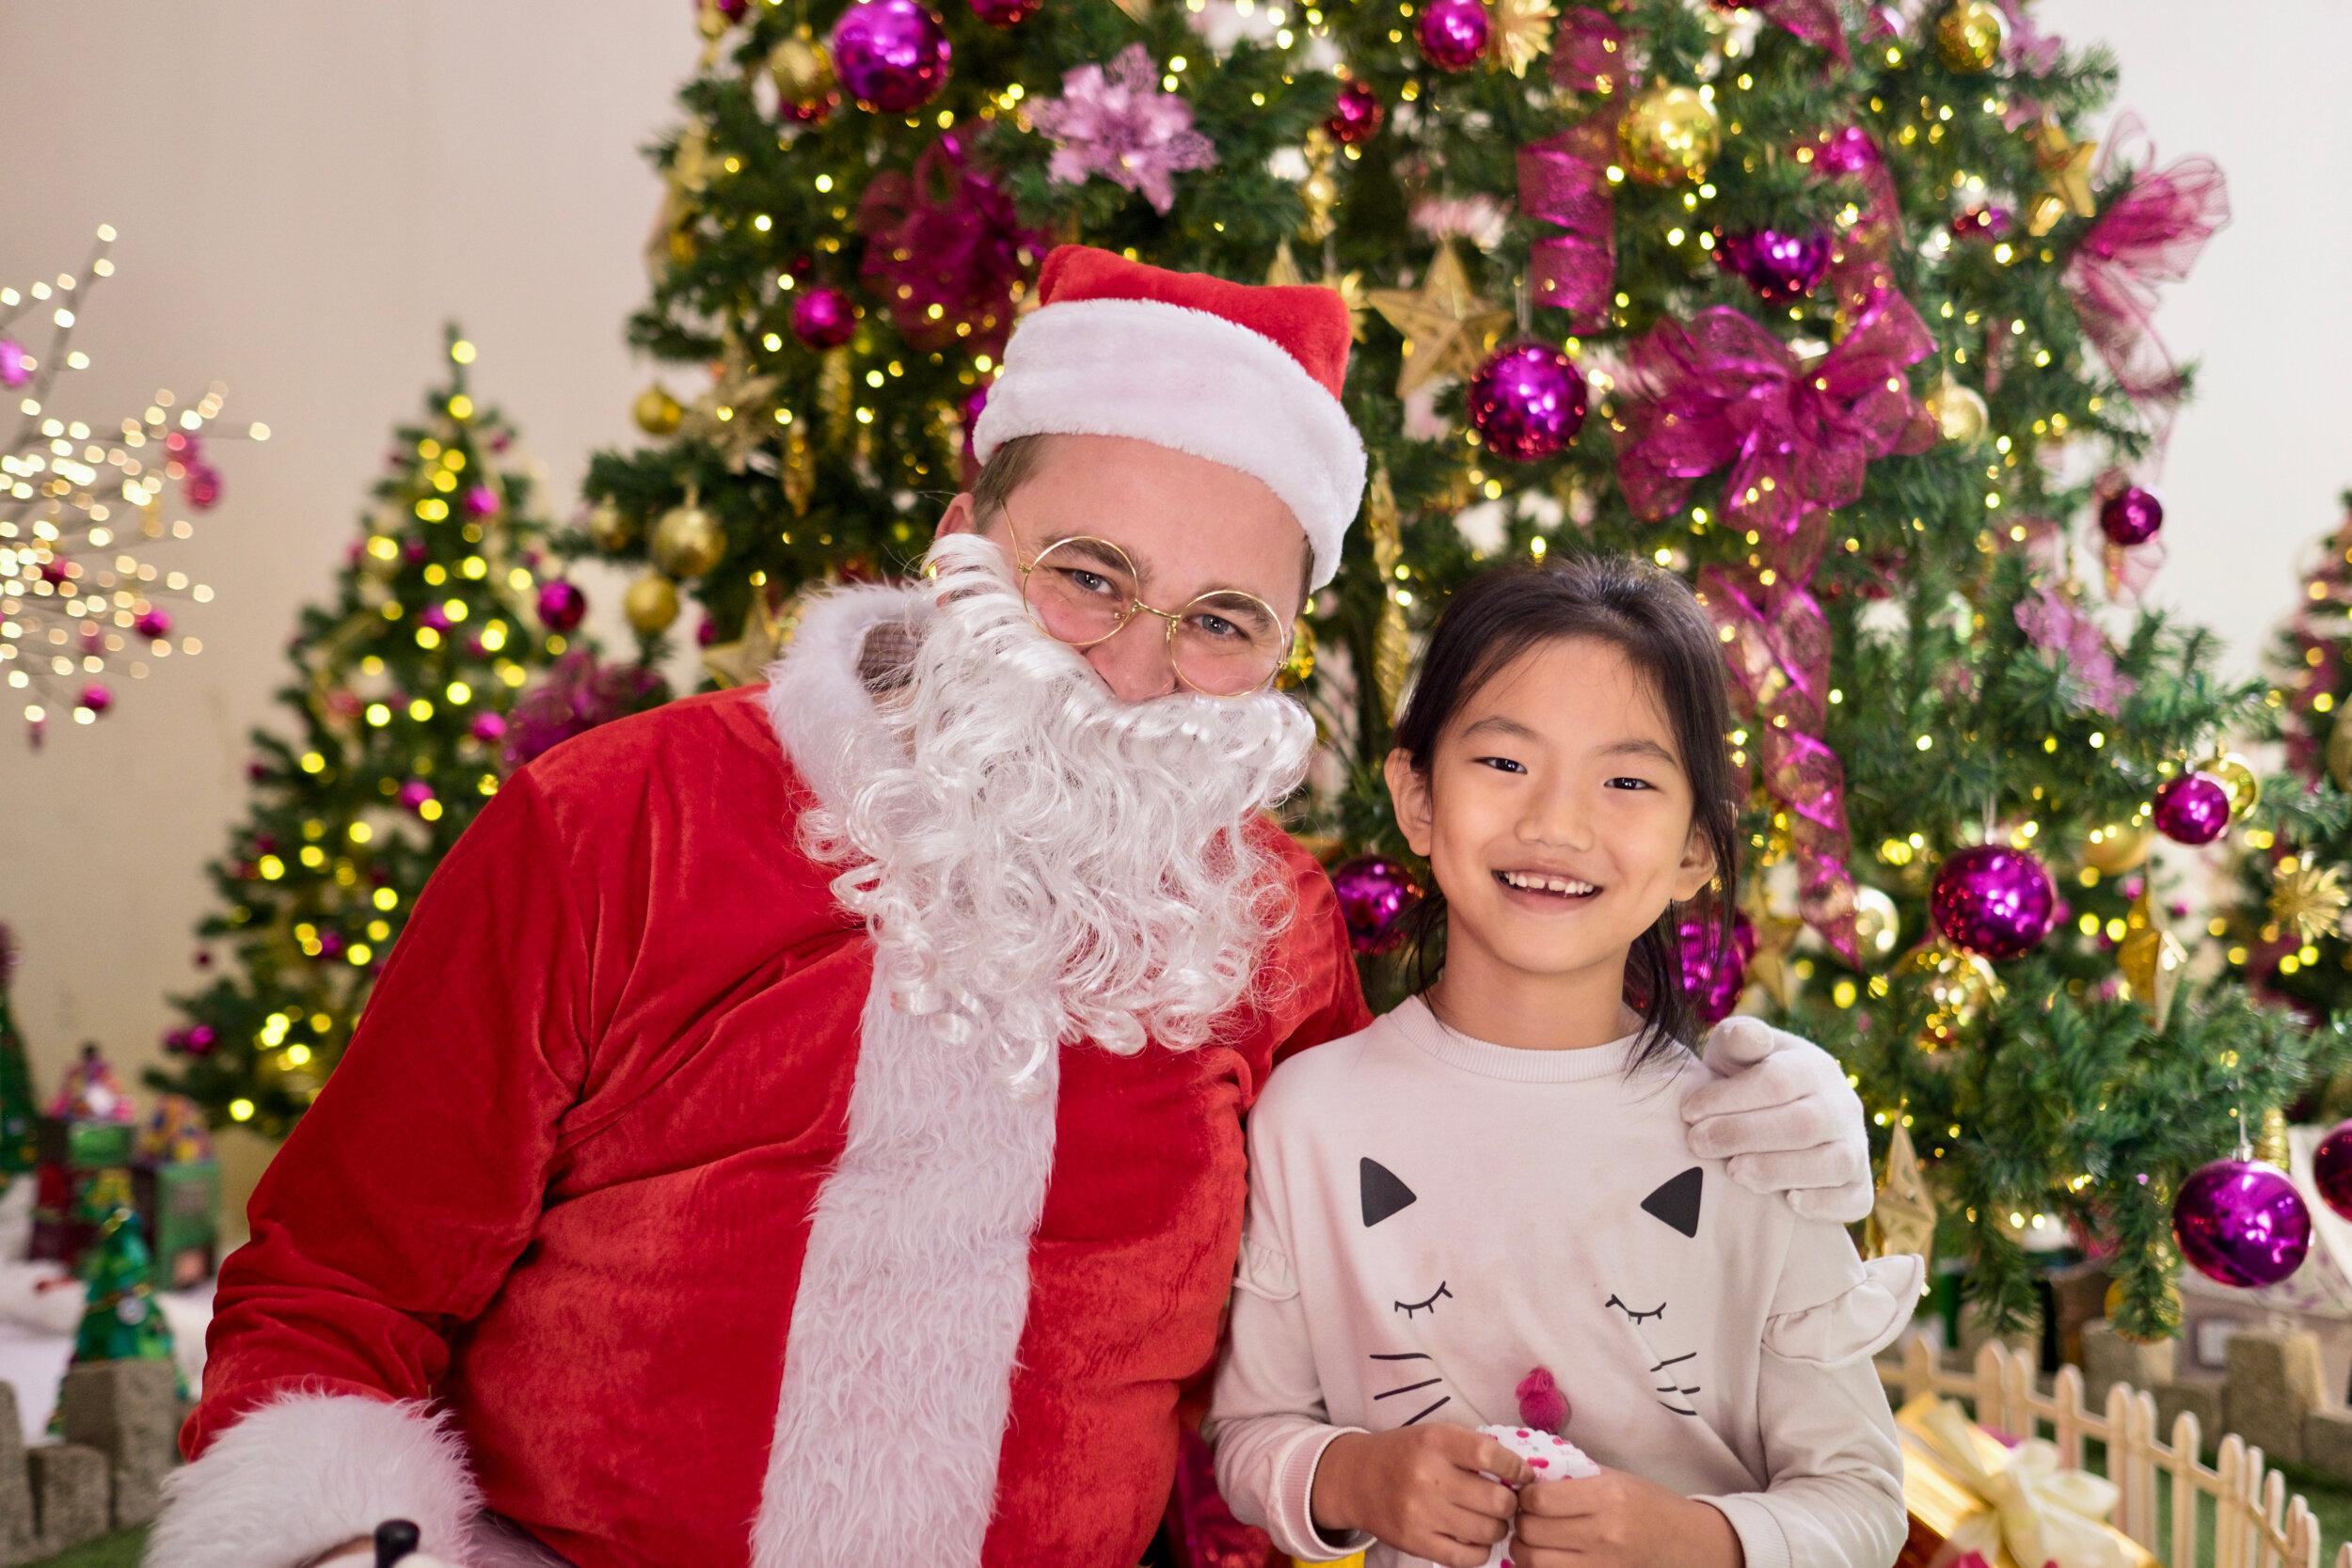 Photoshoot with Santa Clause-540.jpg